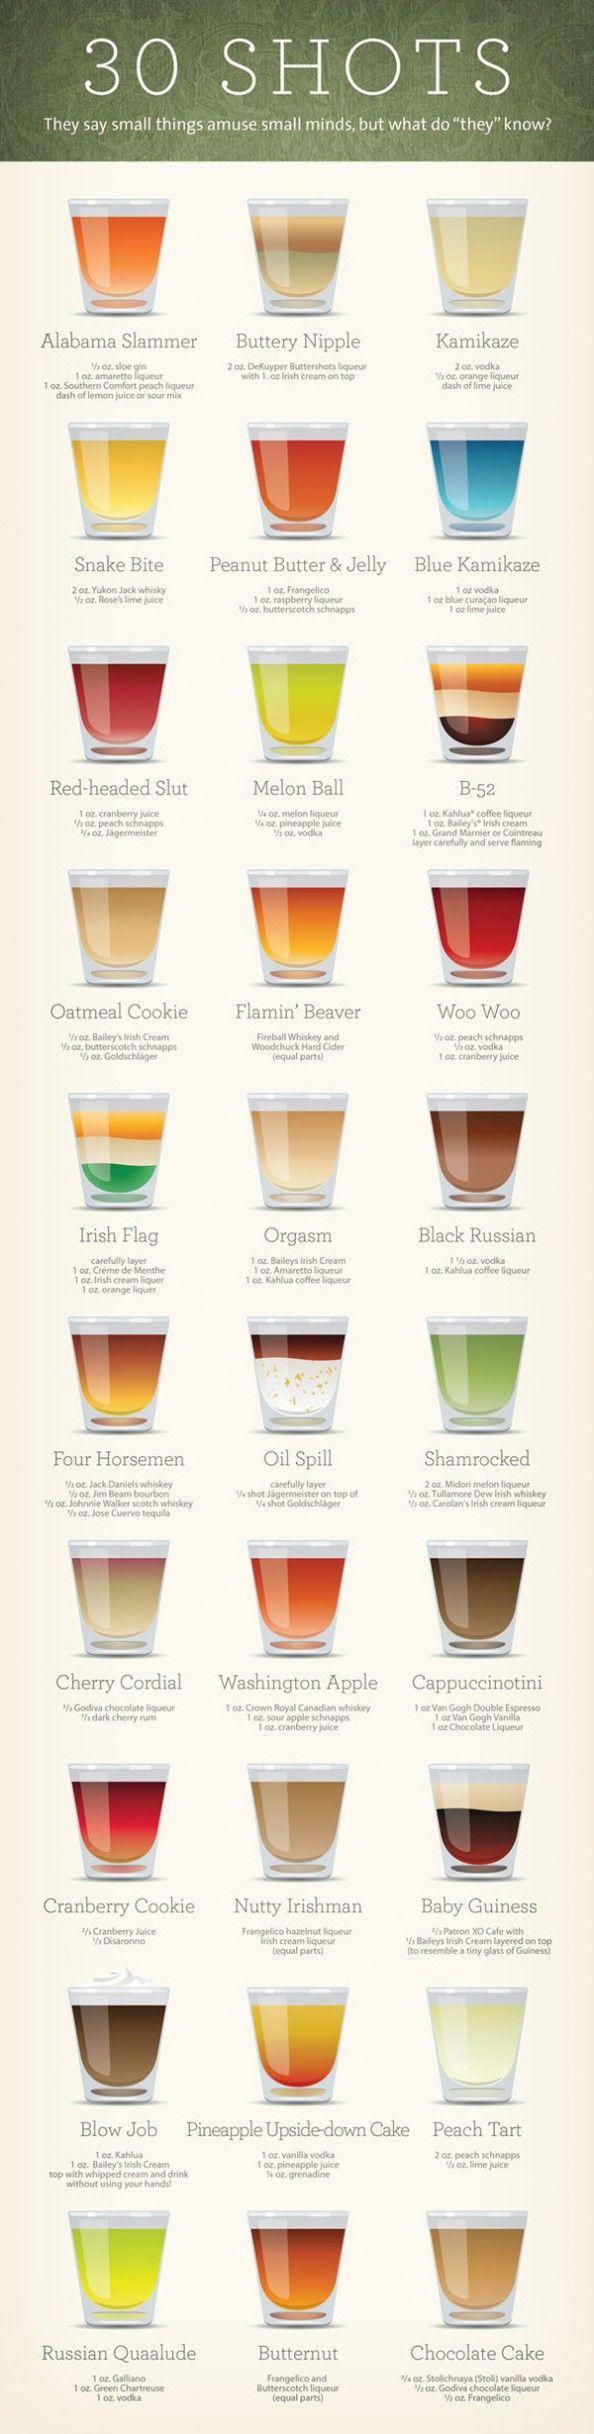 "cocktail shots www.LiquorList.com ""The Marketplace for Adults with Taste"" @LiquorListcom #LiquorList"